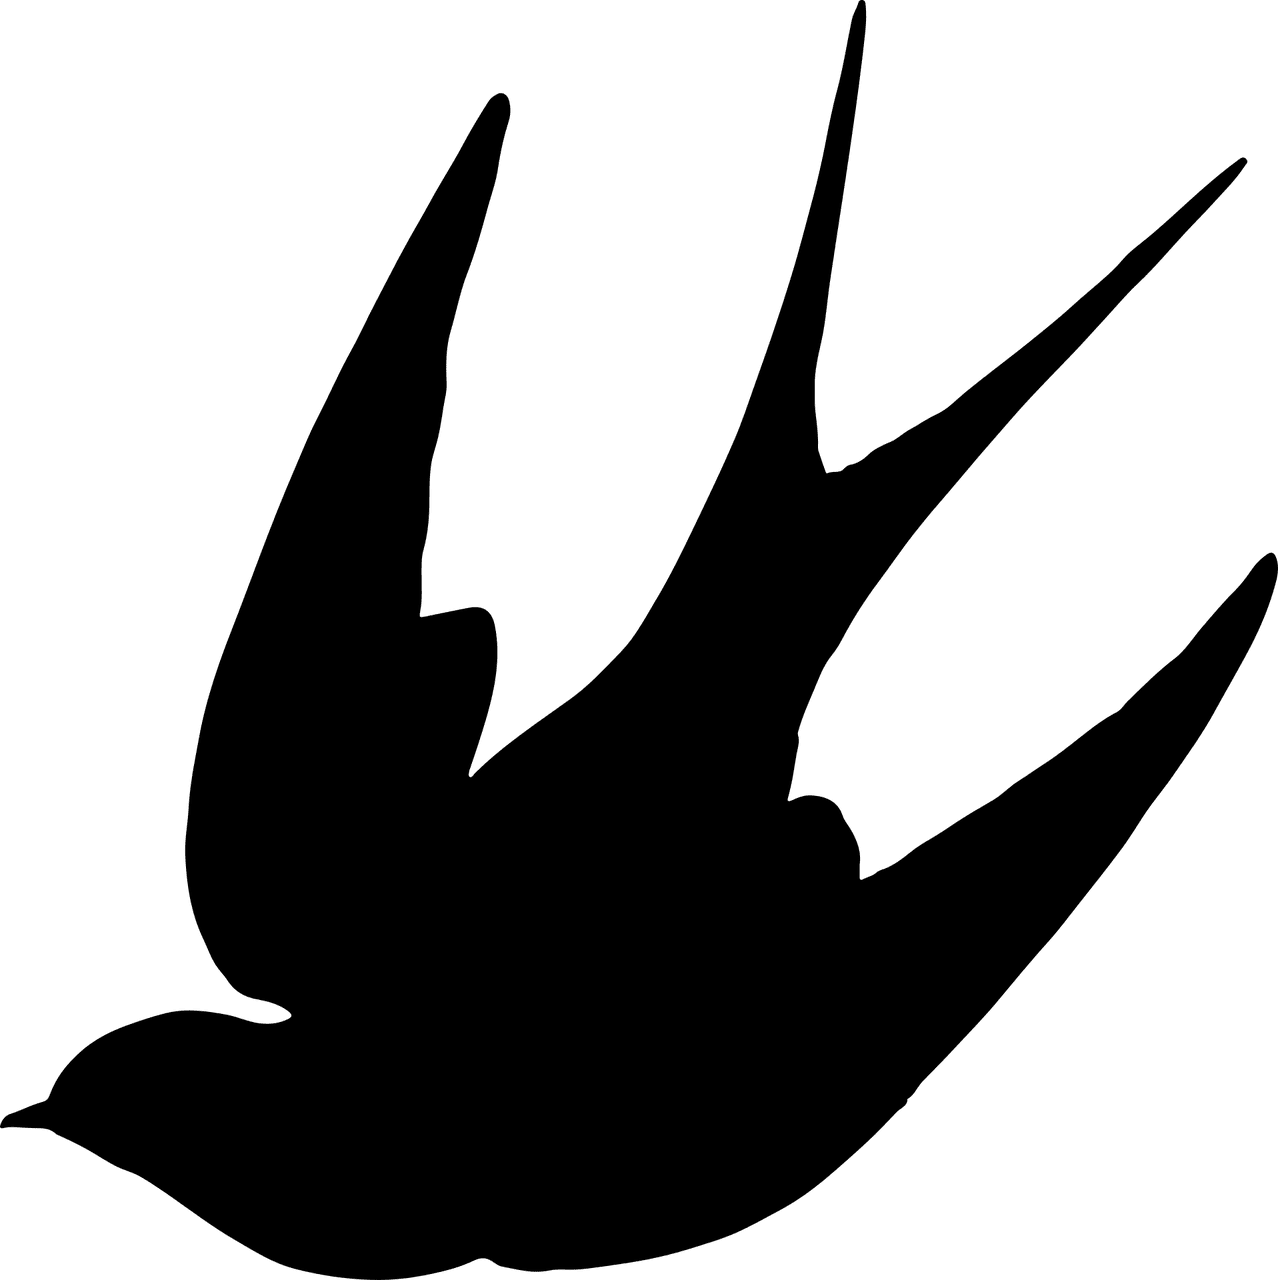 Swallow silhouette tattoo